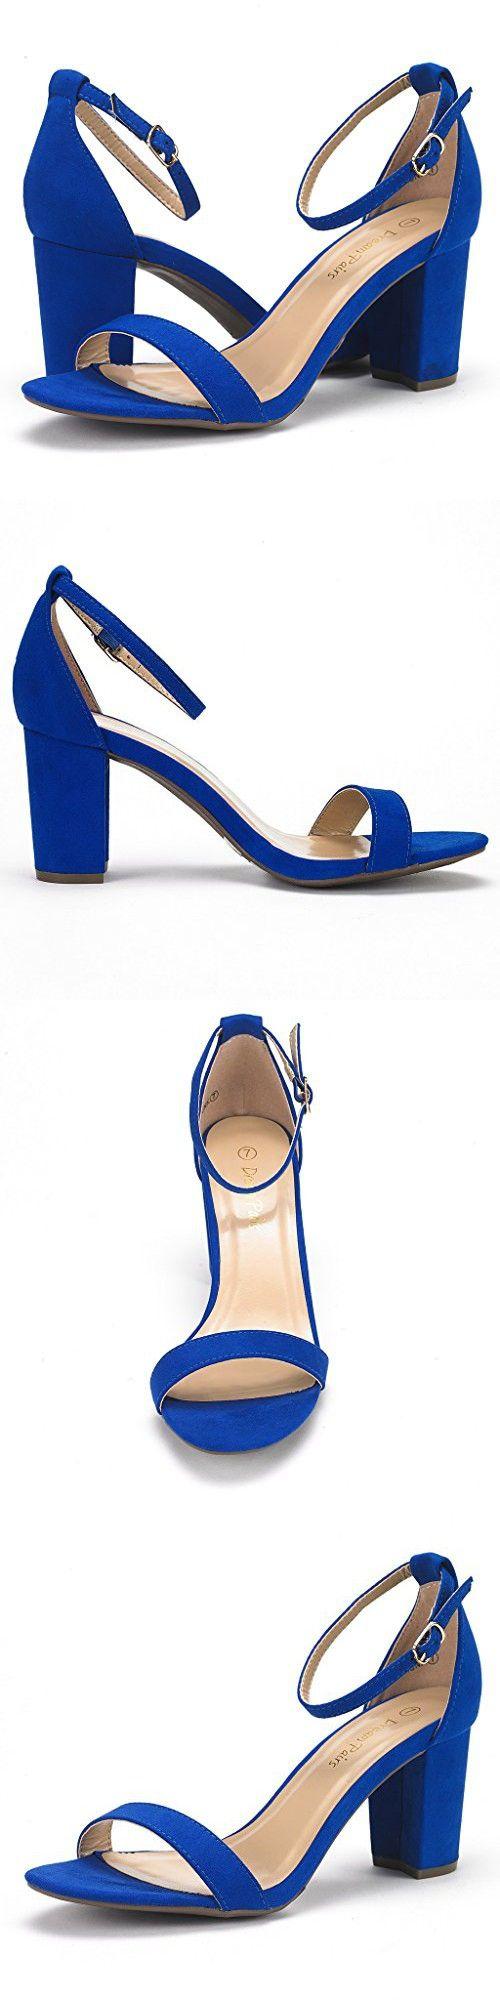 Wedding shoes open toe